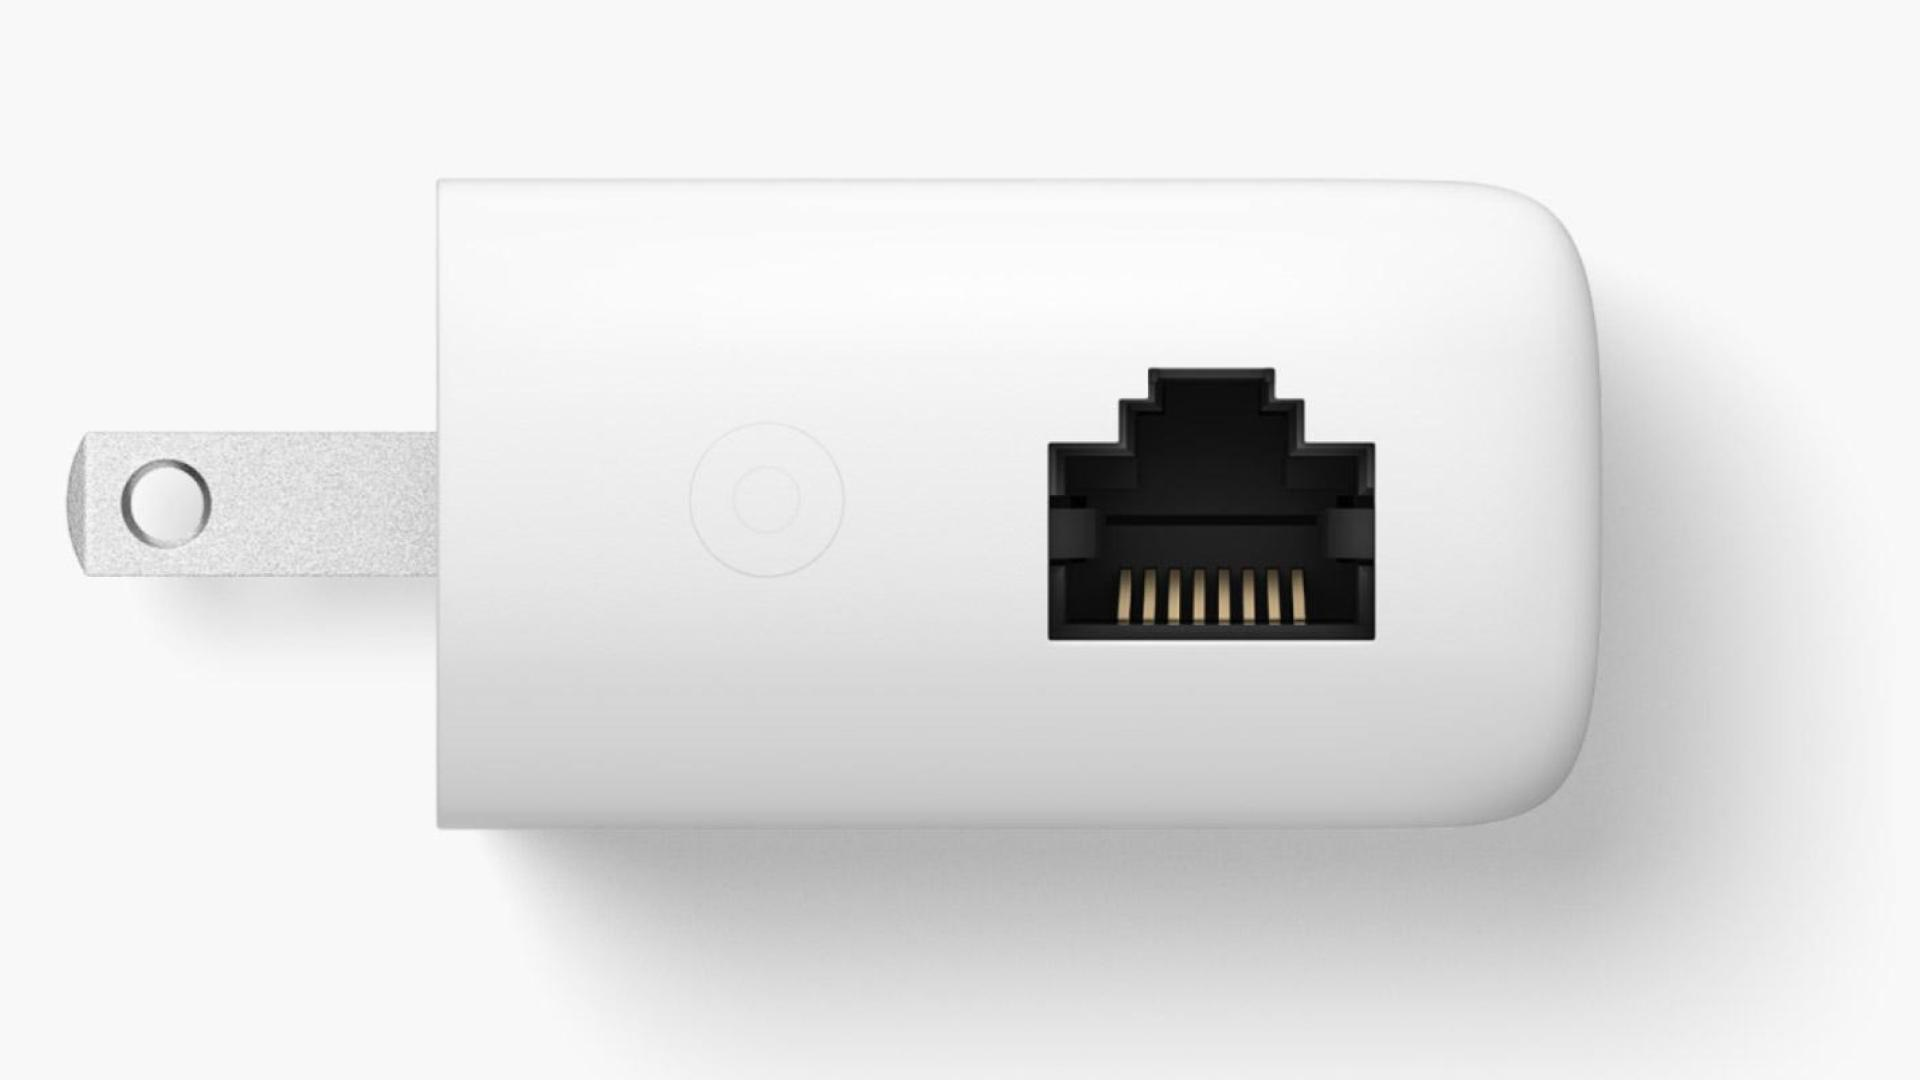 Chromecast with Google TV Ethernet Adapter